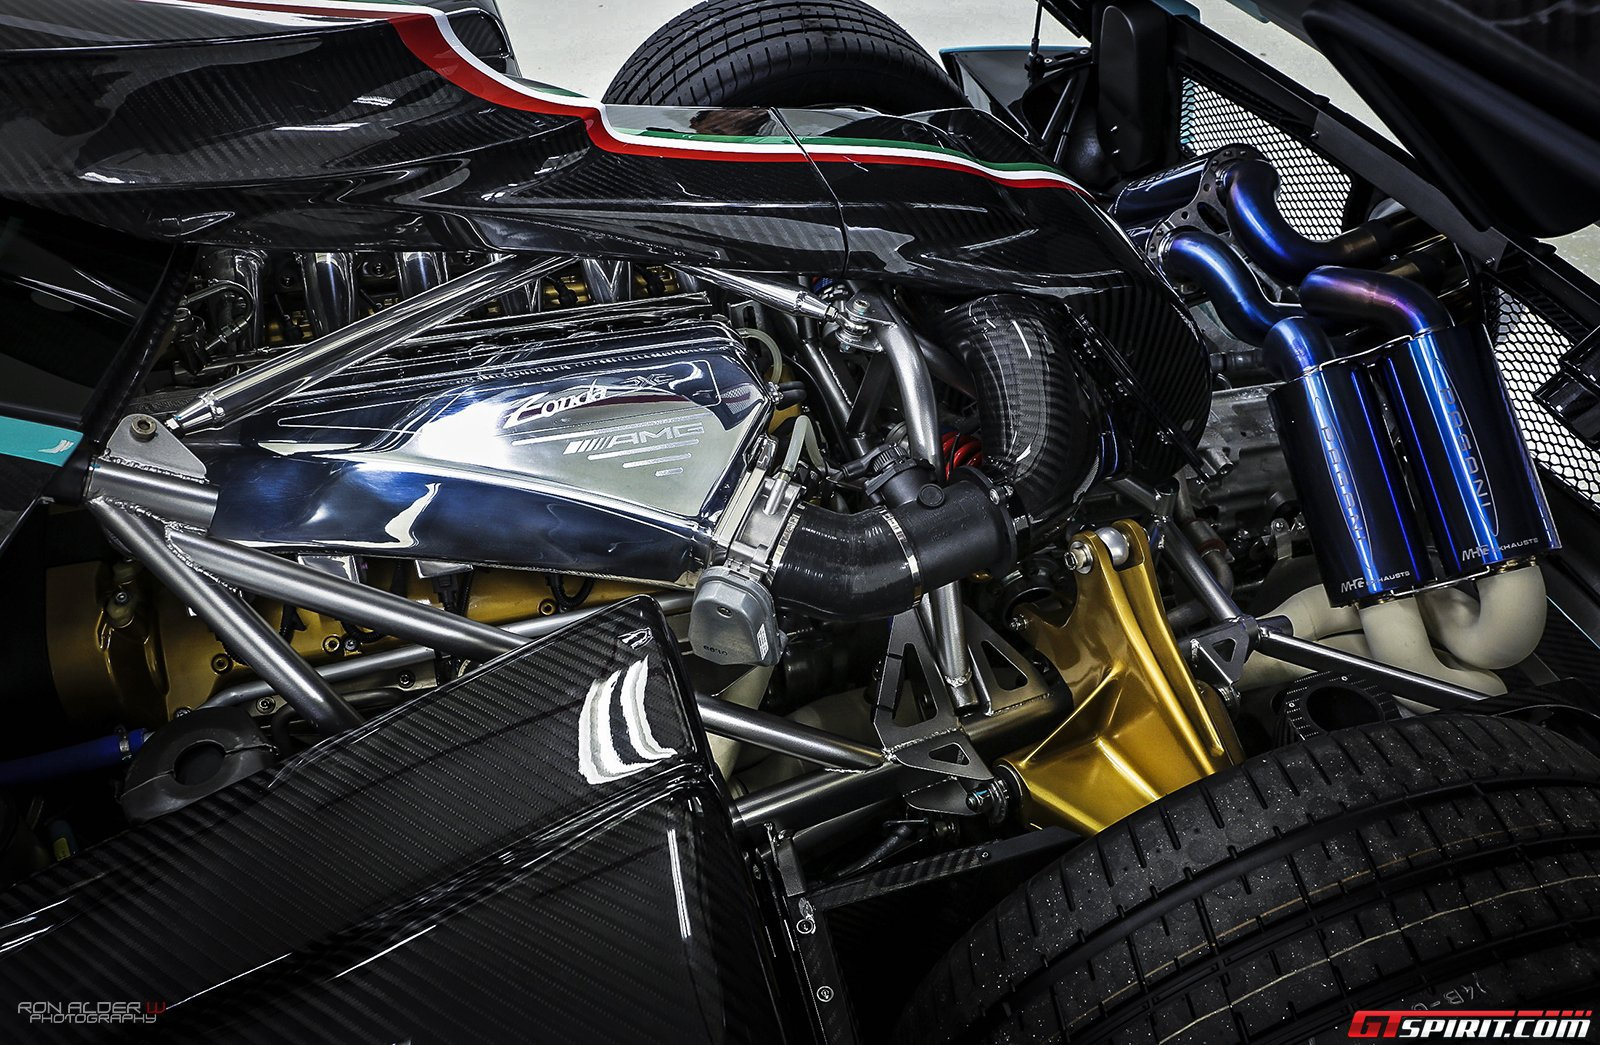 Pagani Zonda Revolucion Usb Interface   Top Cars Wallpapers Gallery 1600x1045